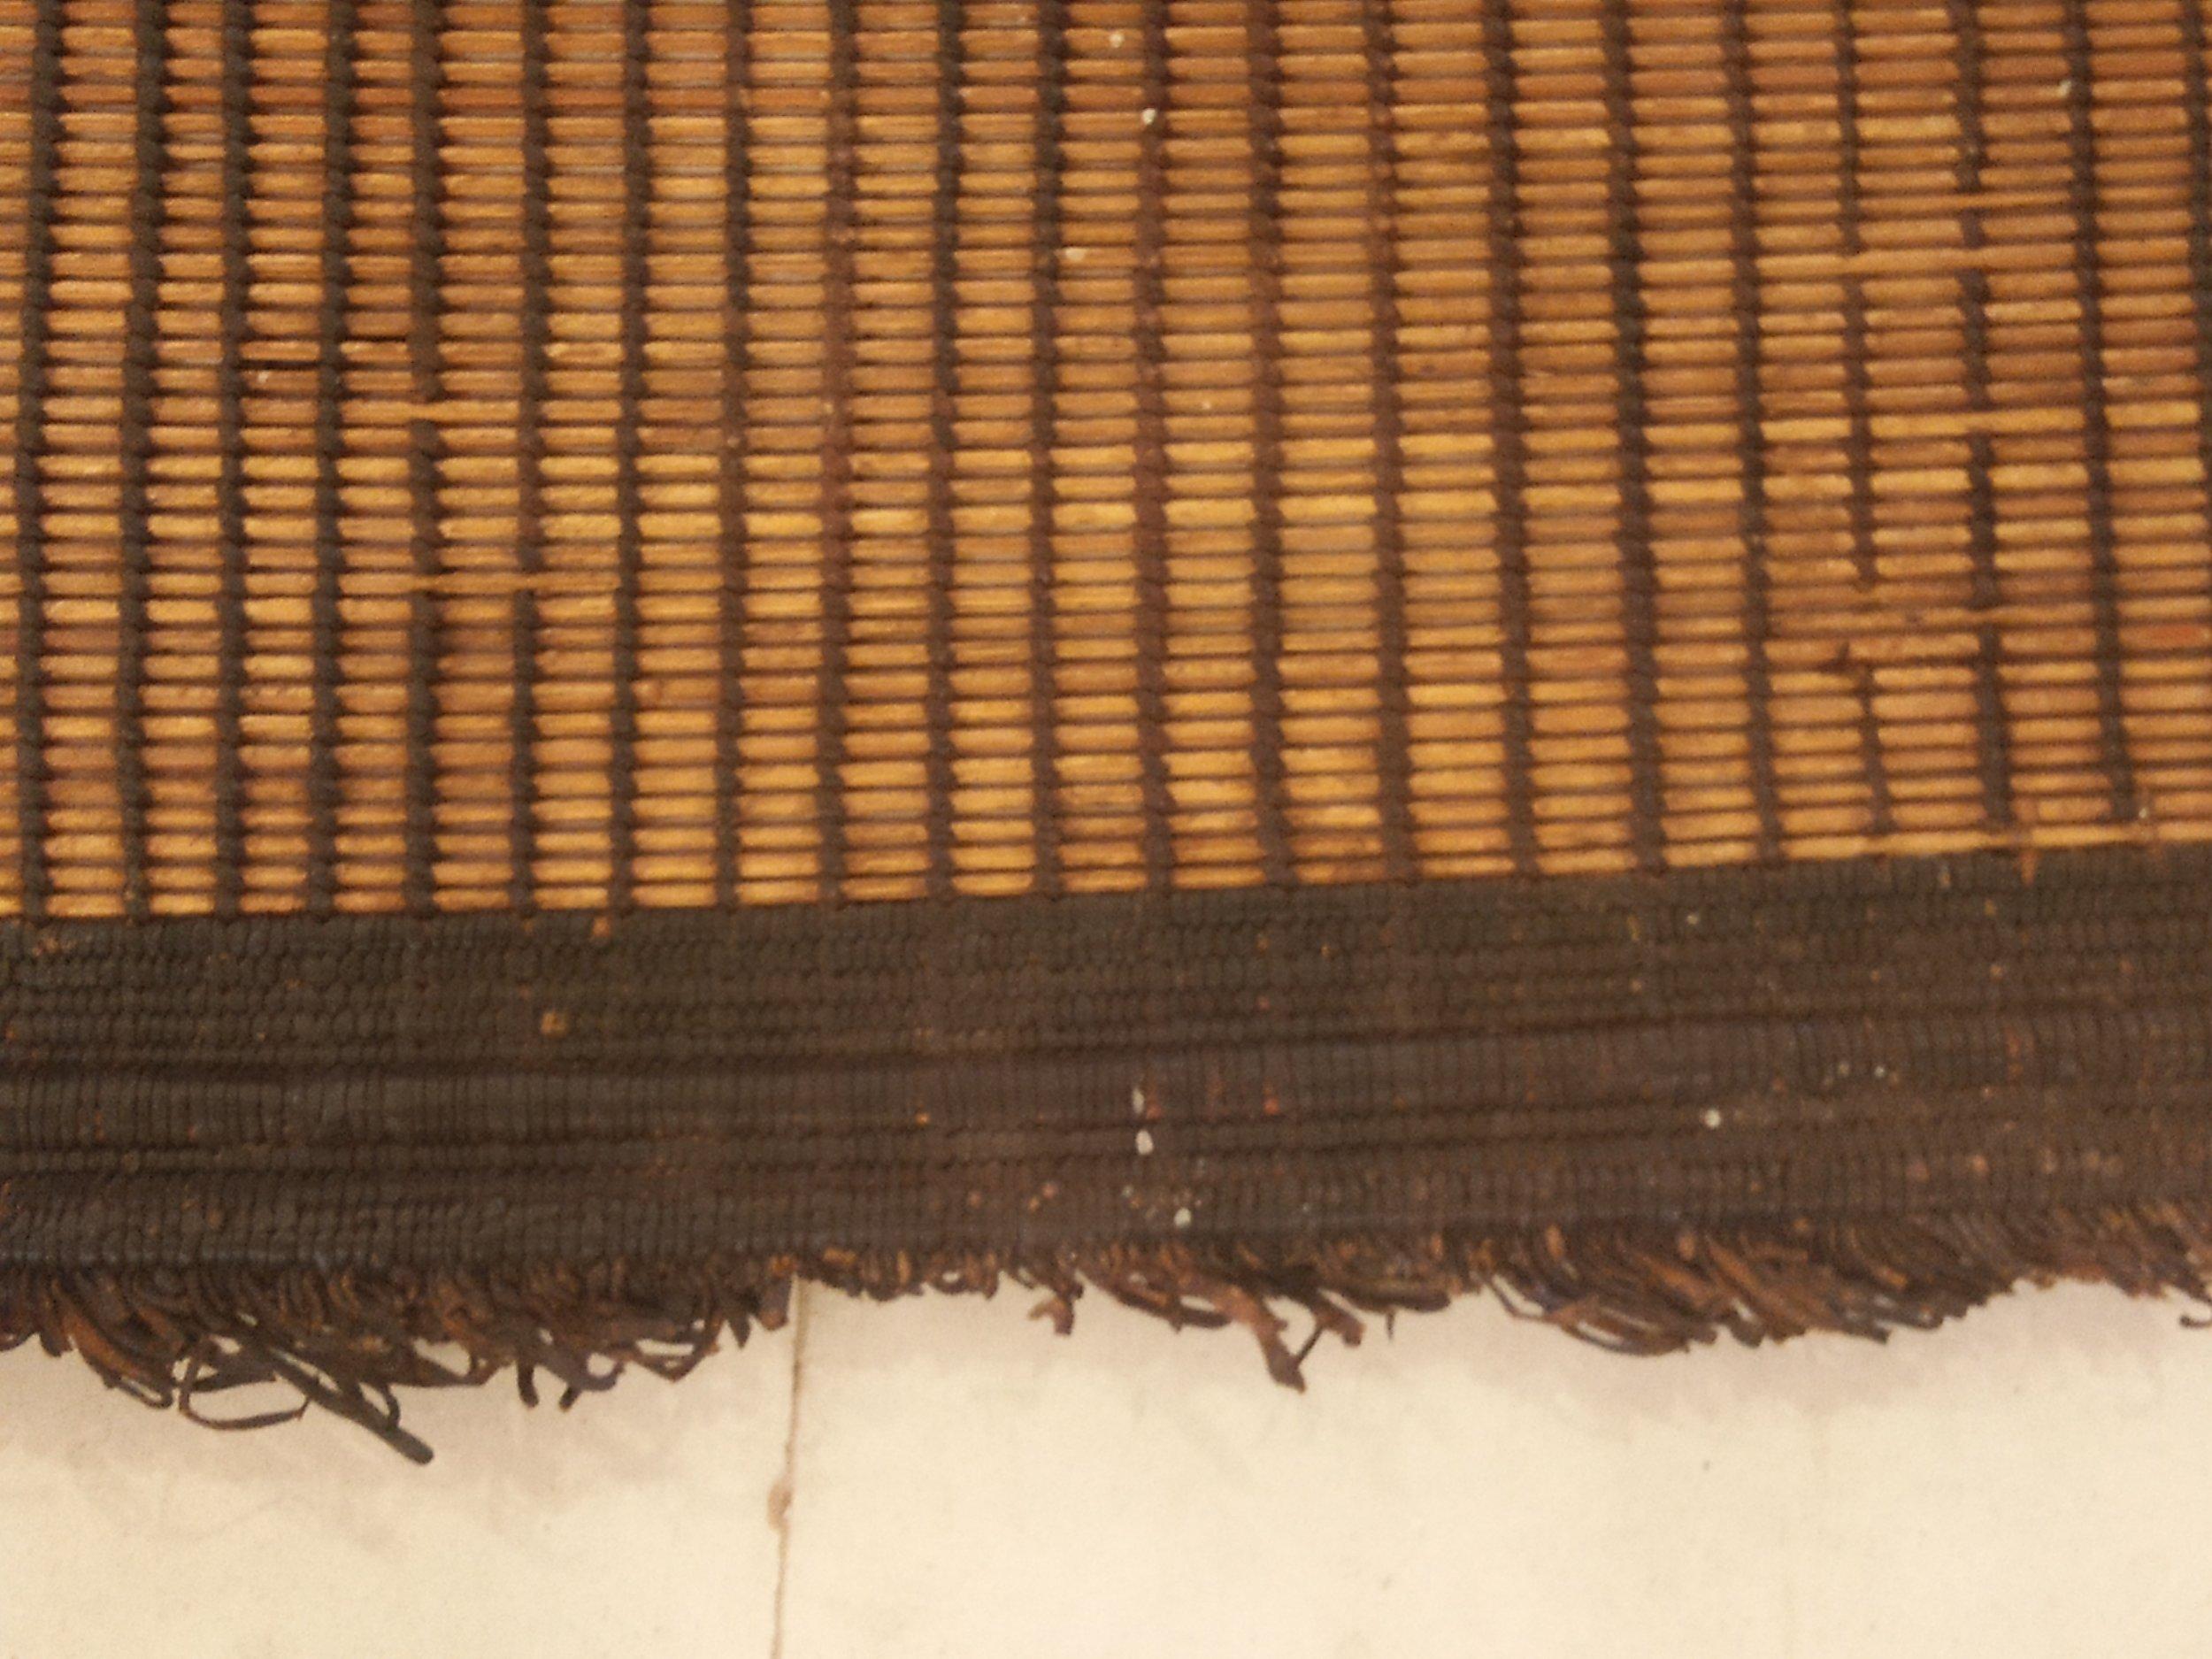 Tuareg leather and straw mat Moroccan Berber Carpets.jpg